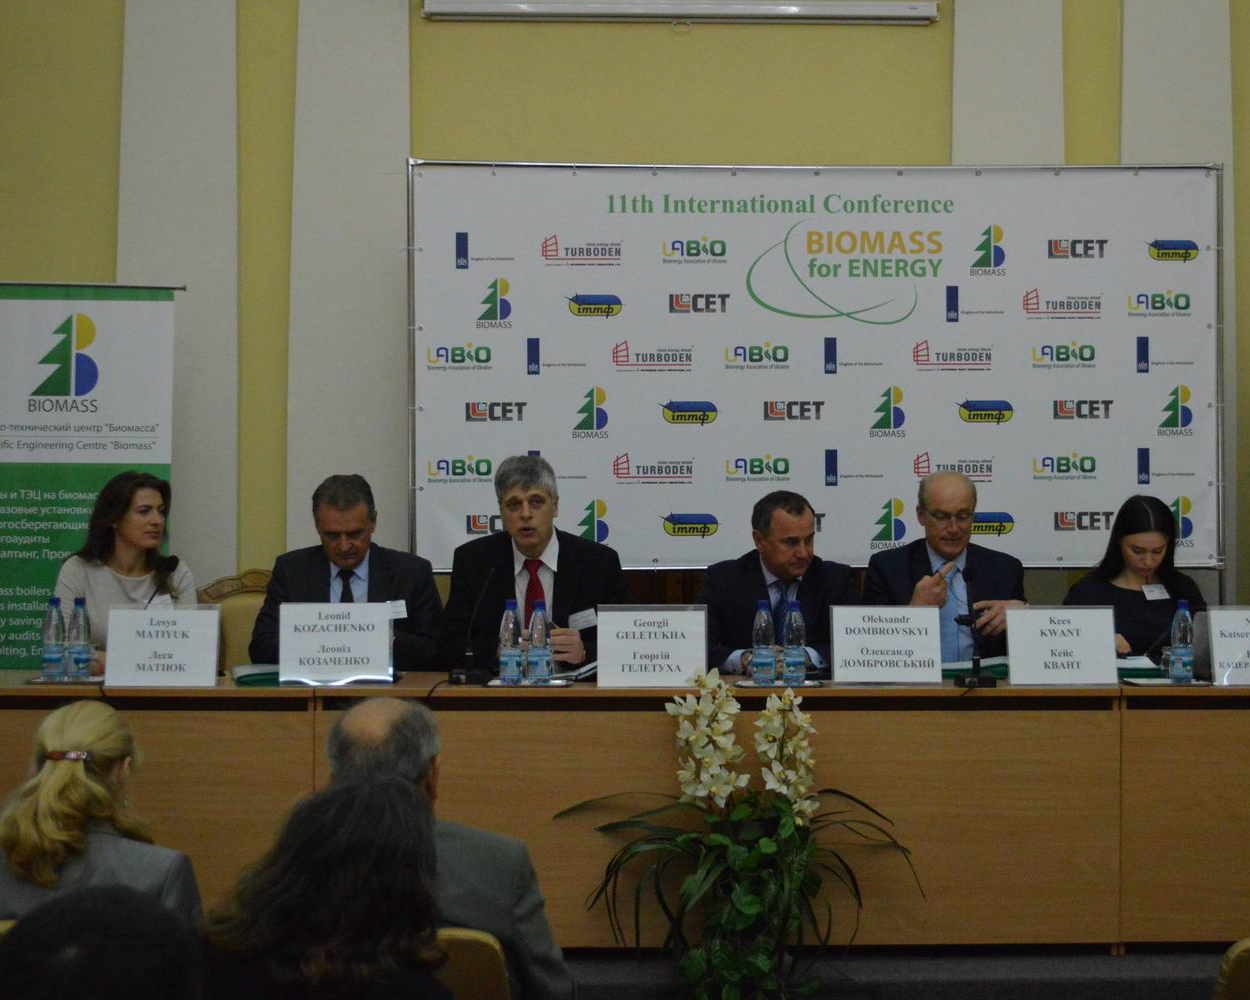 b4e conference 2015